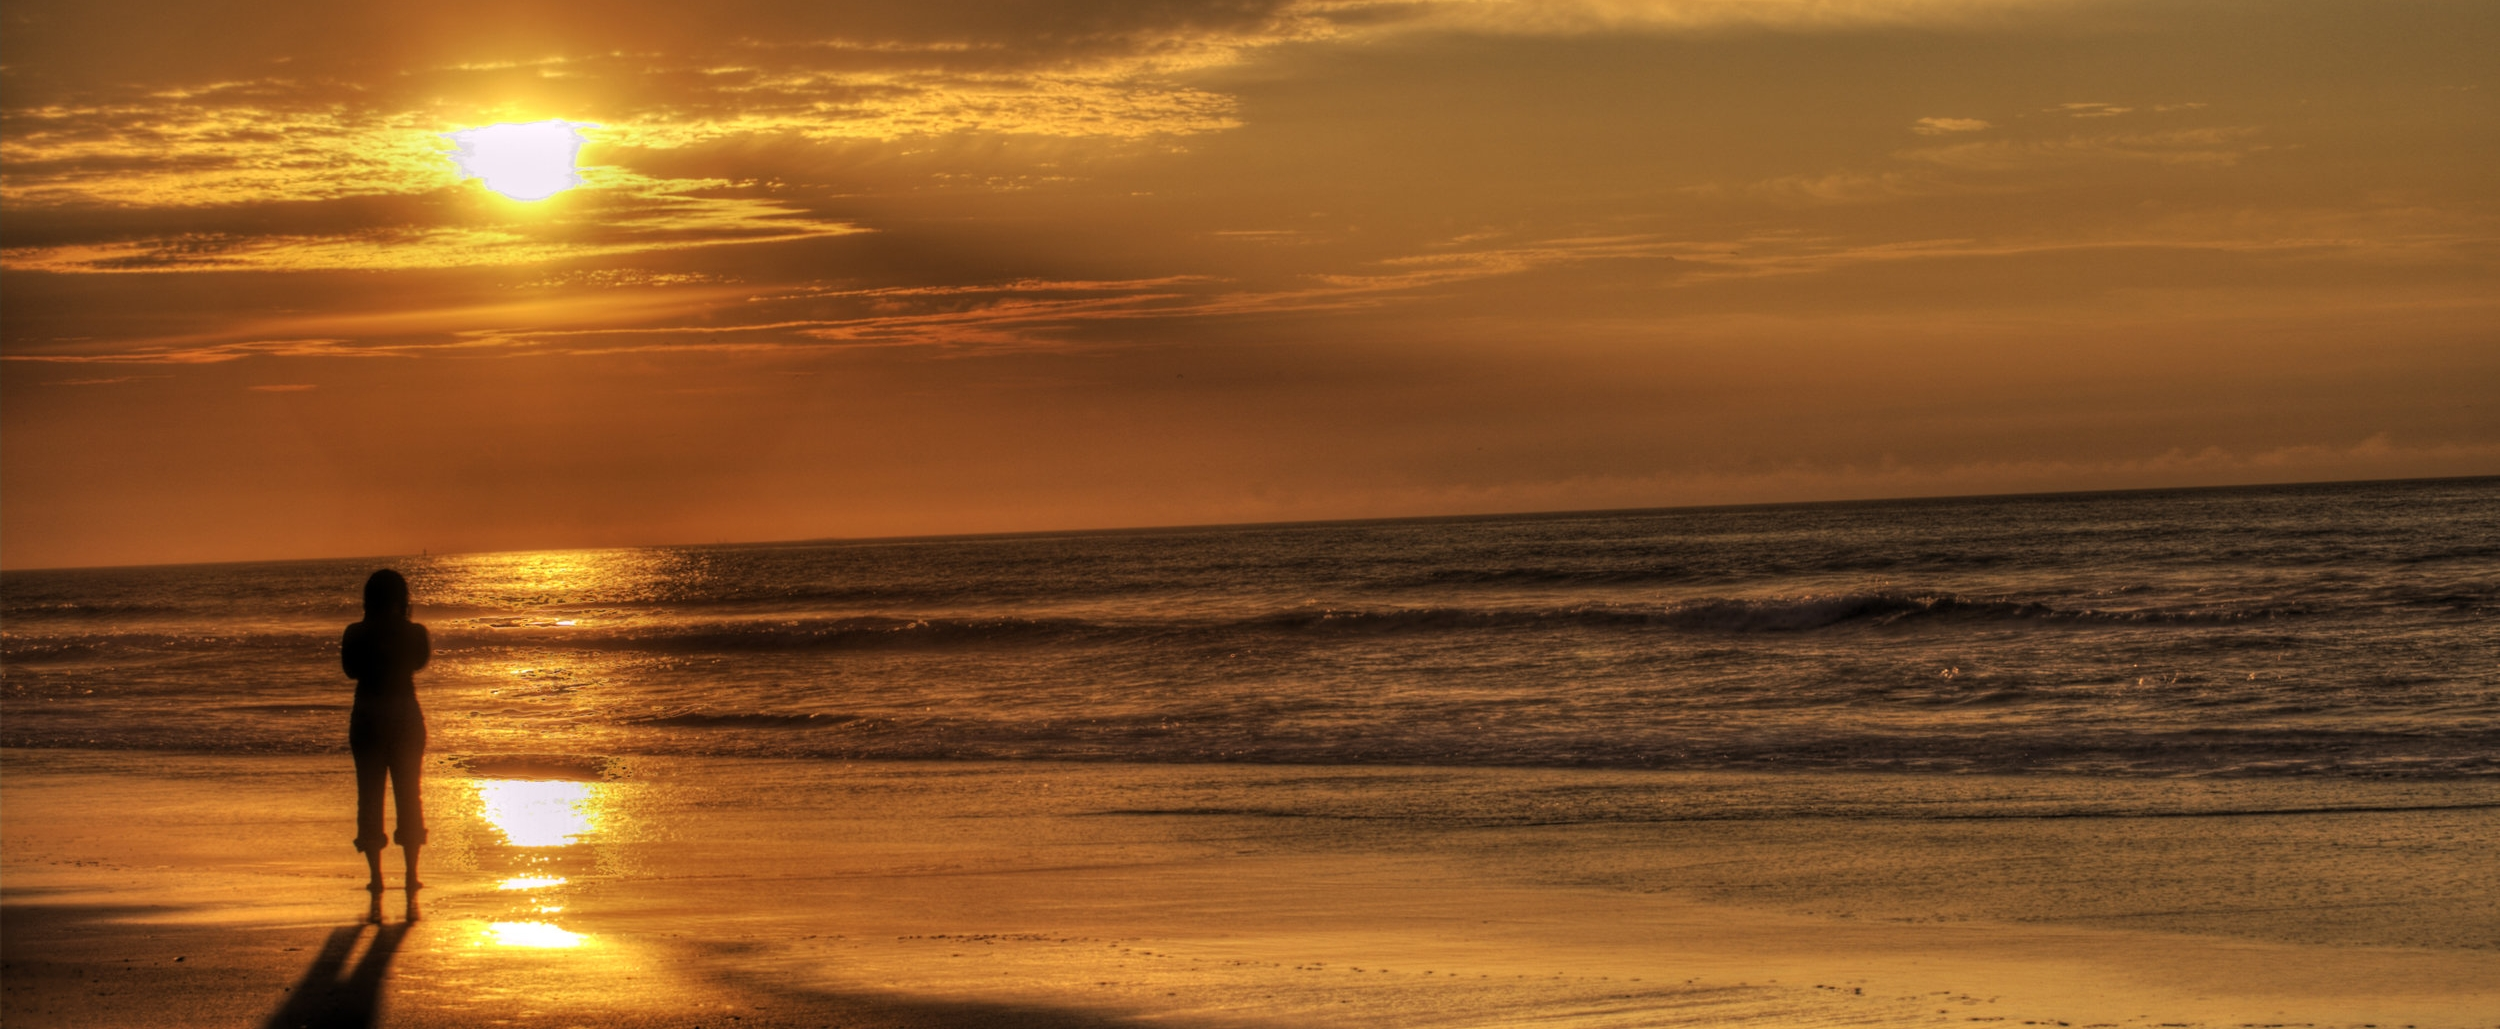 sunrise_on_the_beach_by_darkphoenix36-d4rskd2.jpg